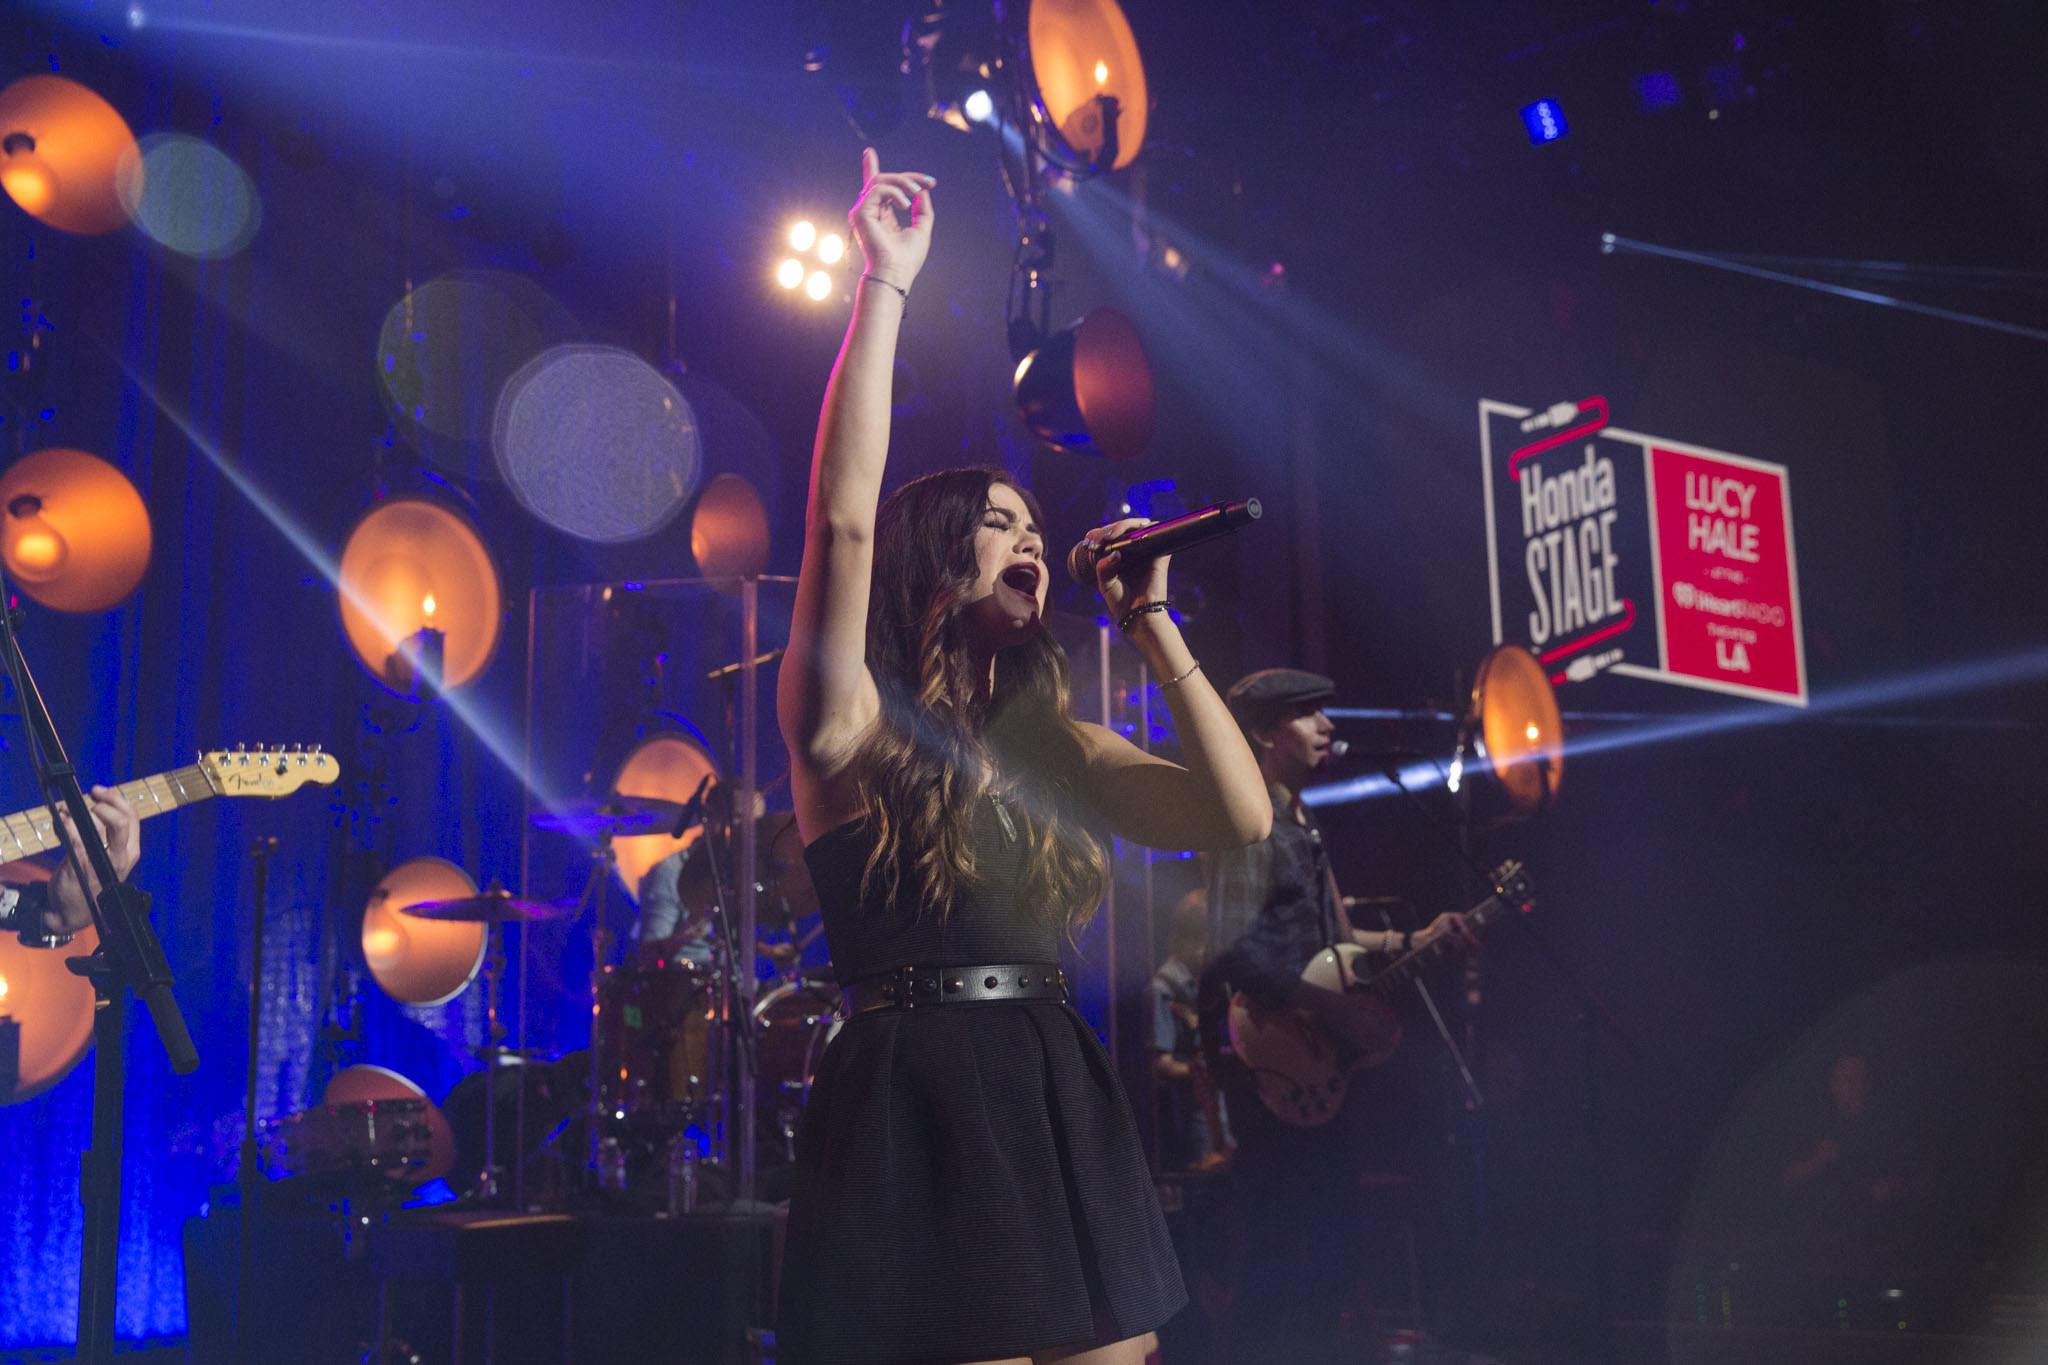 Lucy Hale, Christina Perri and Ariana Grande Set for LA's  iHeartRadio Theater